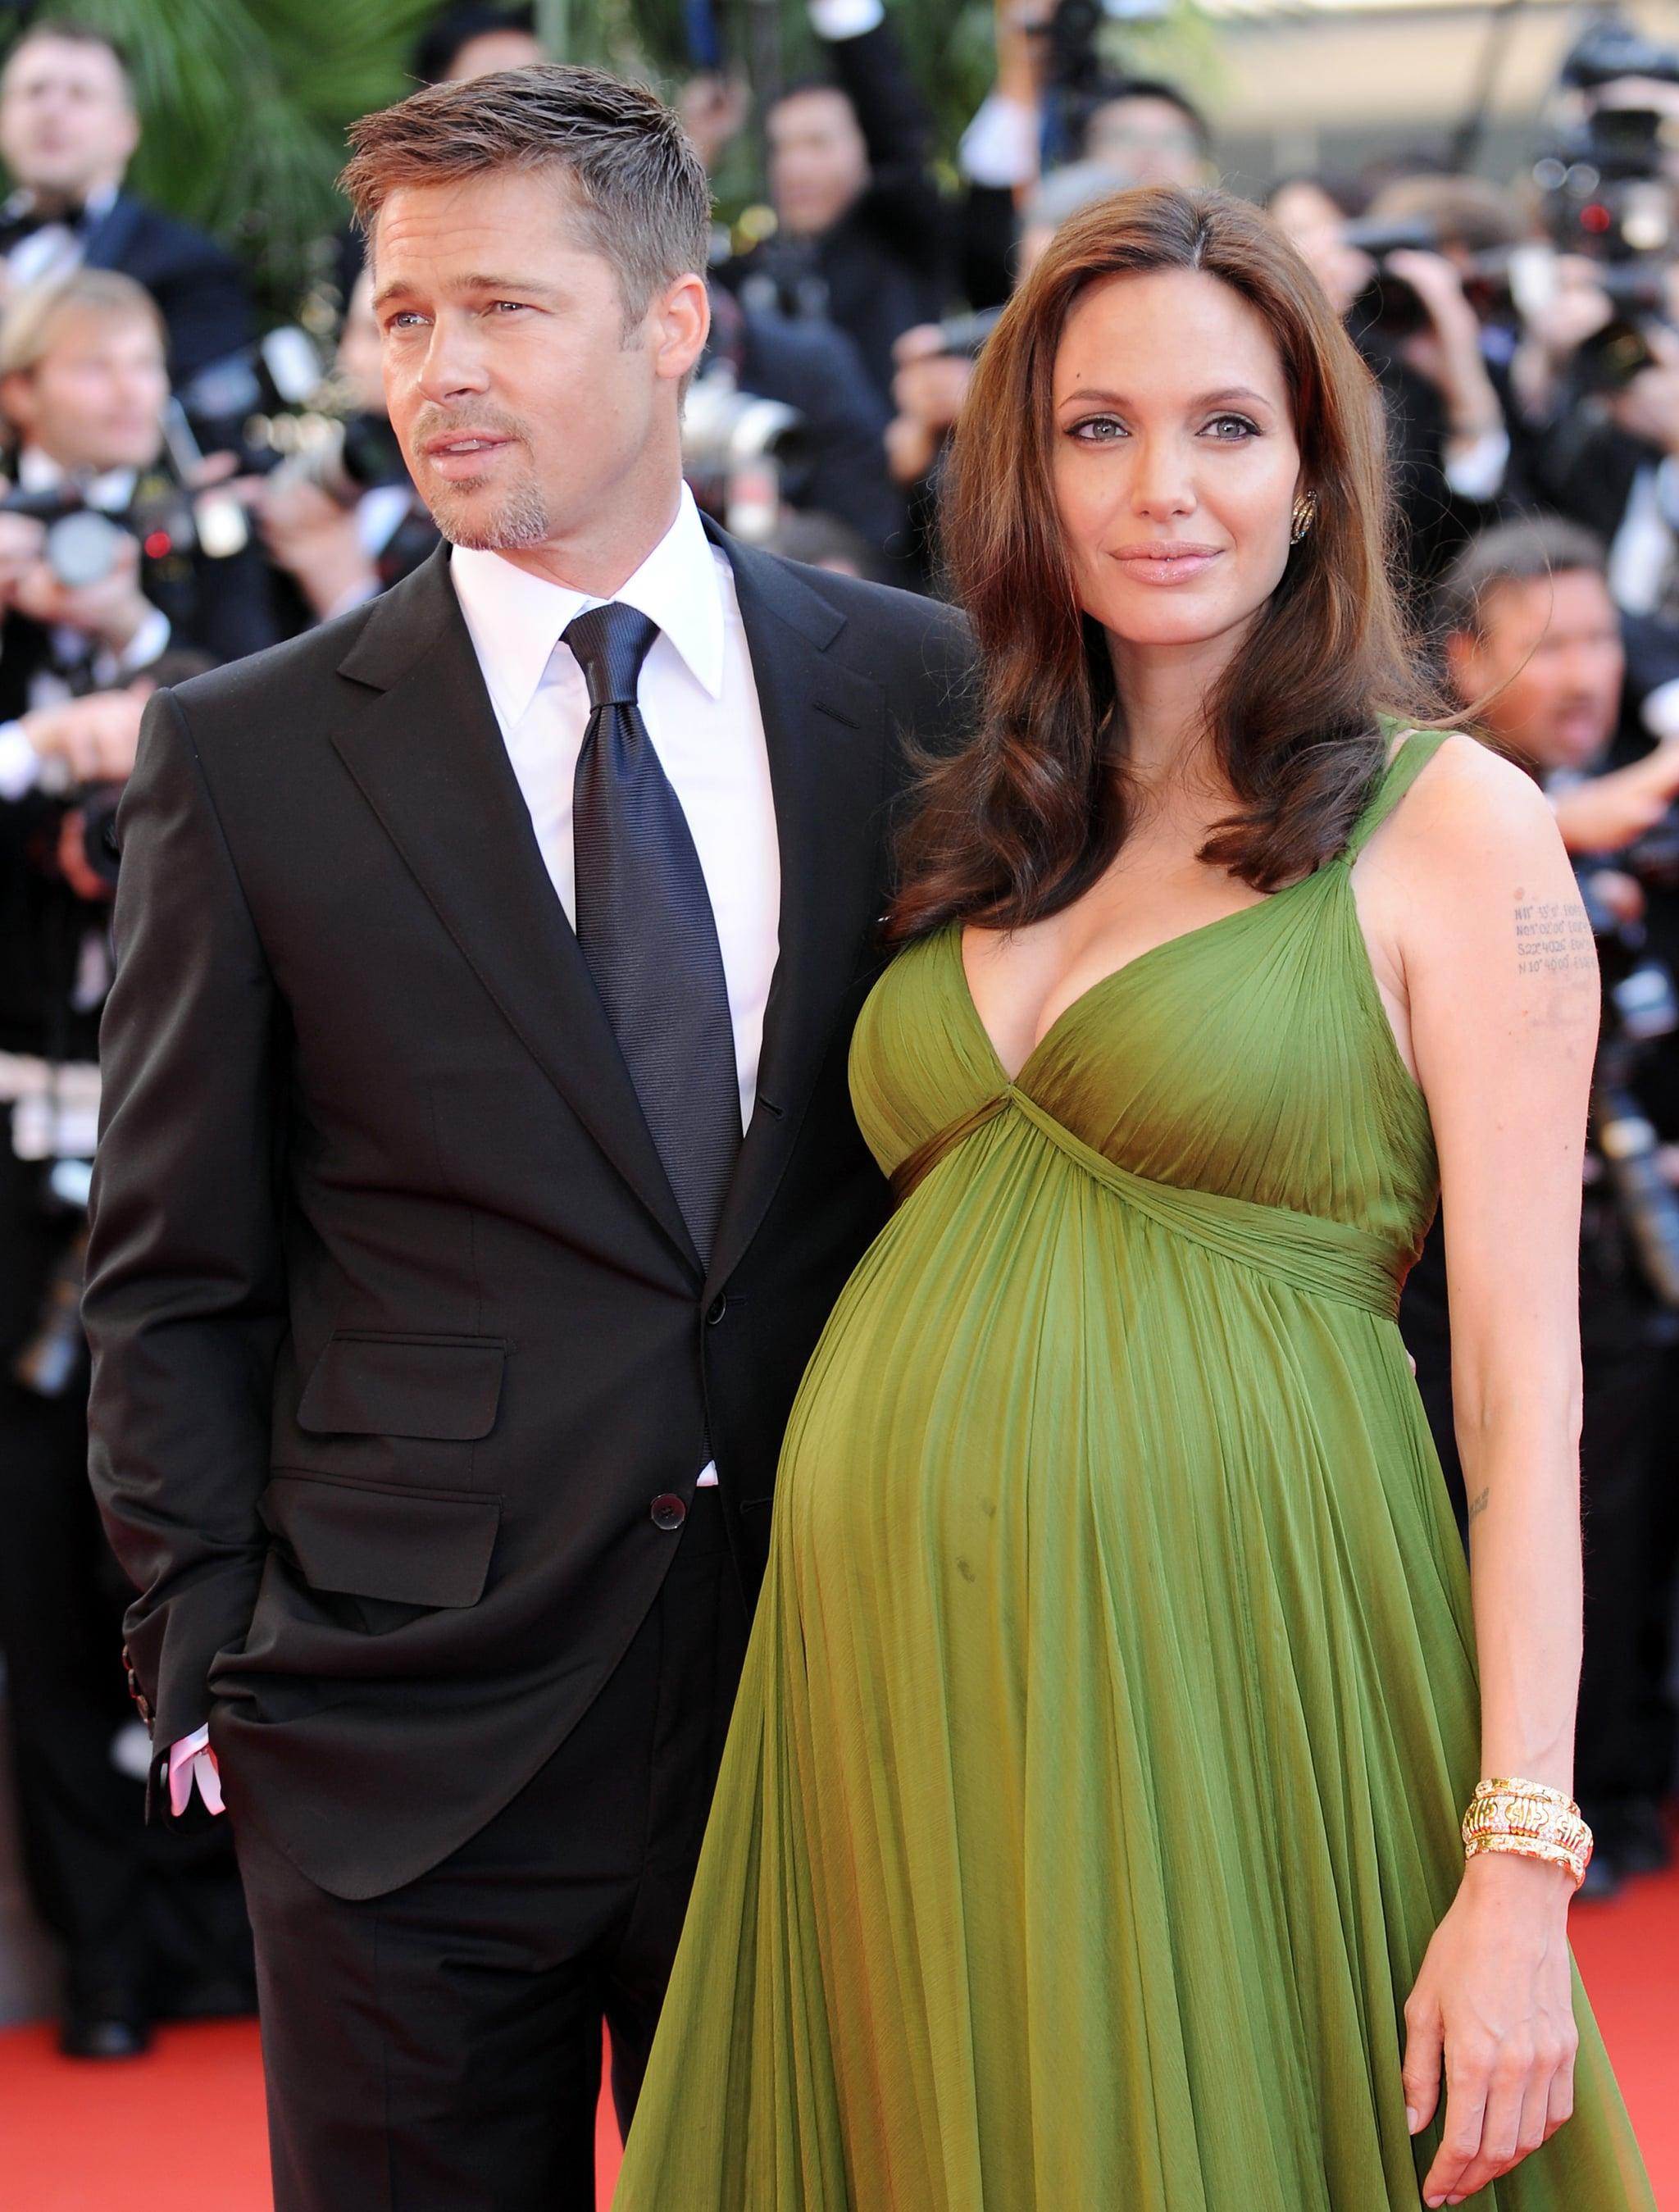 Brad Pitt and Angelina Jolie in 2008